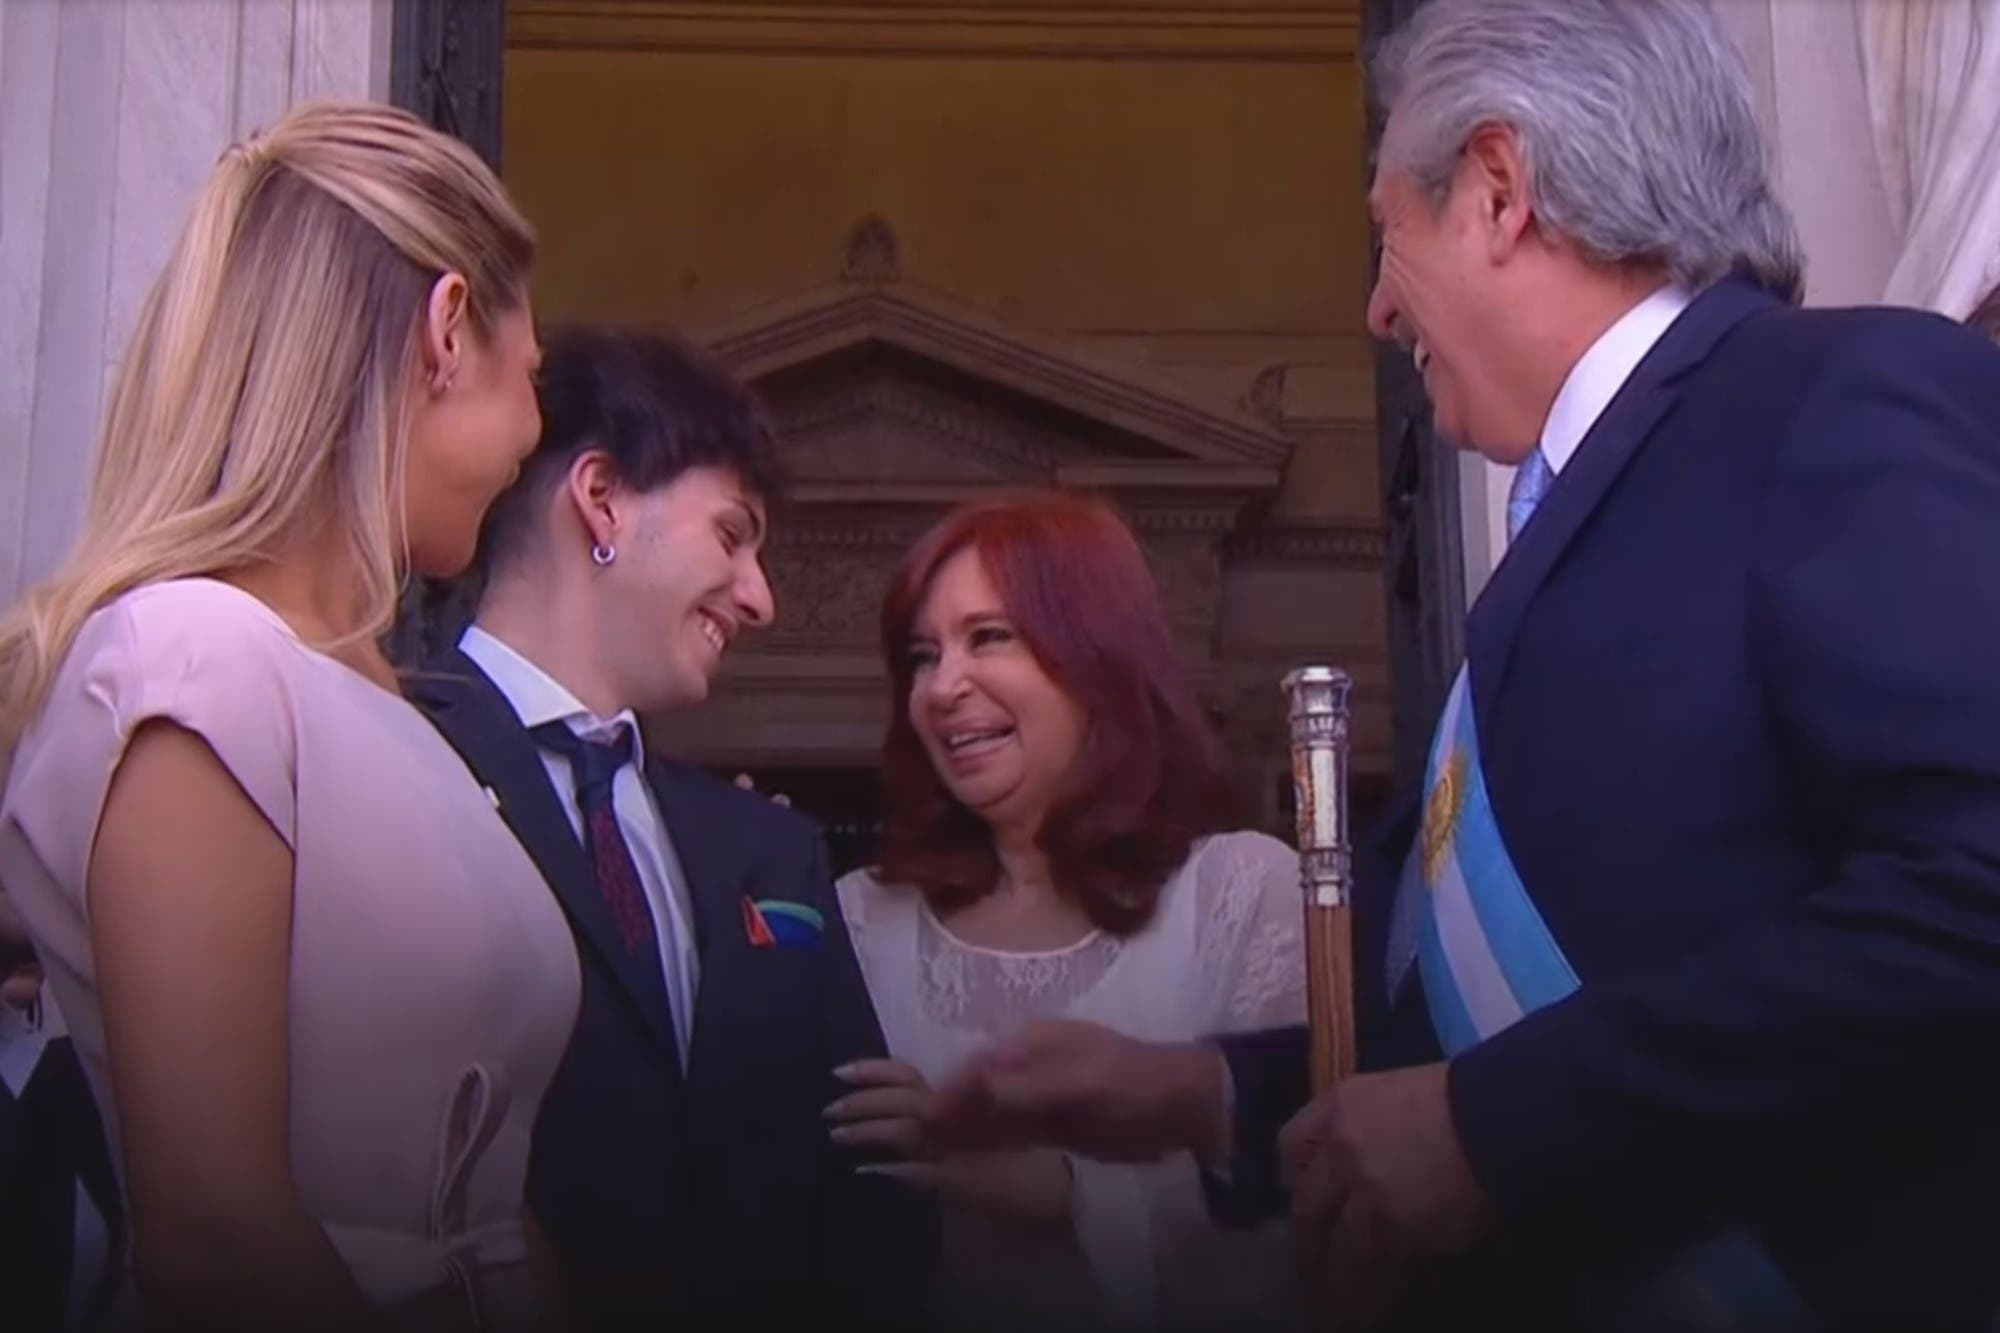 """Canje, todo canje"": el desopilante comentario de Estanislao Fernández que hizo reír a Cristina Kirchner"